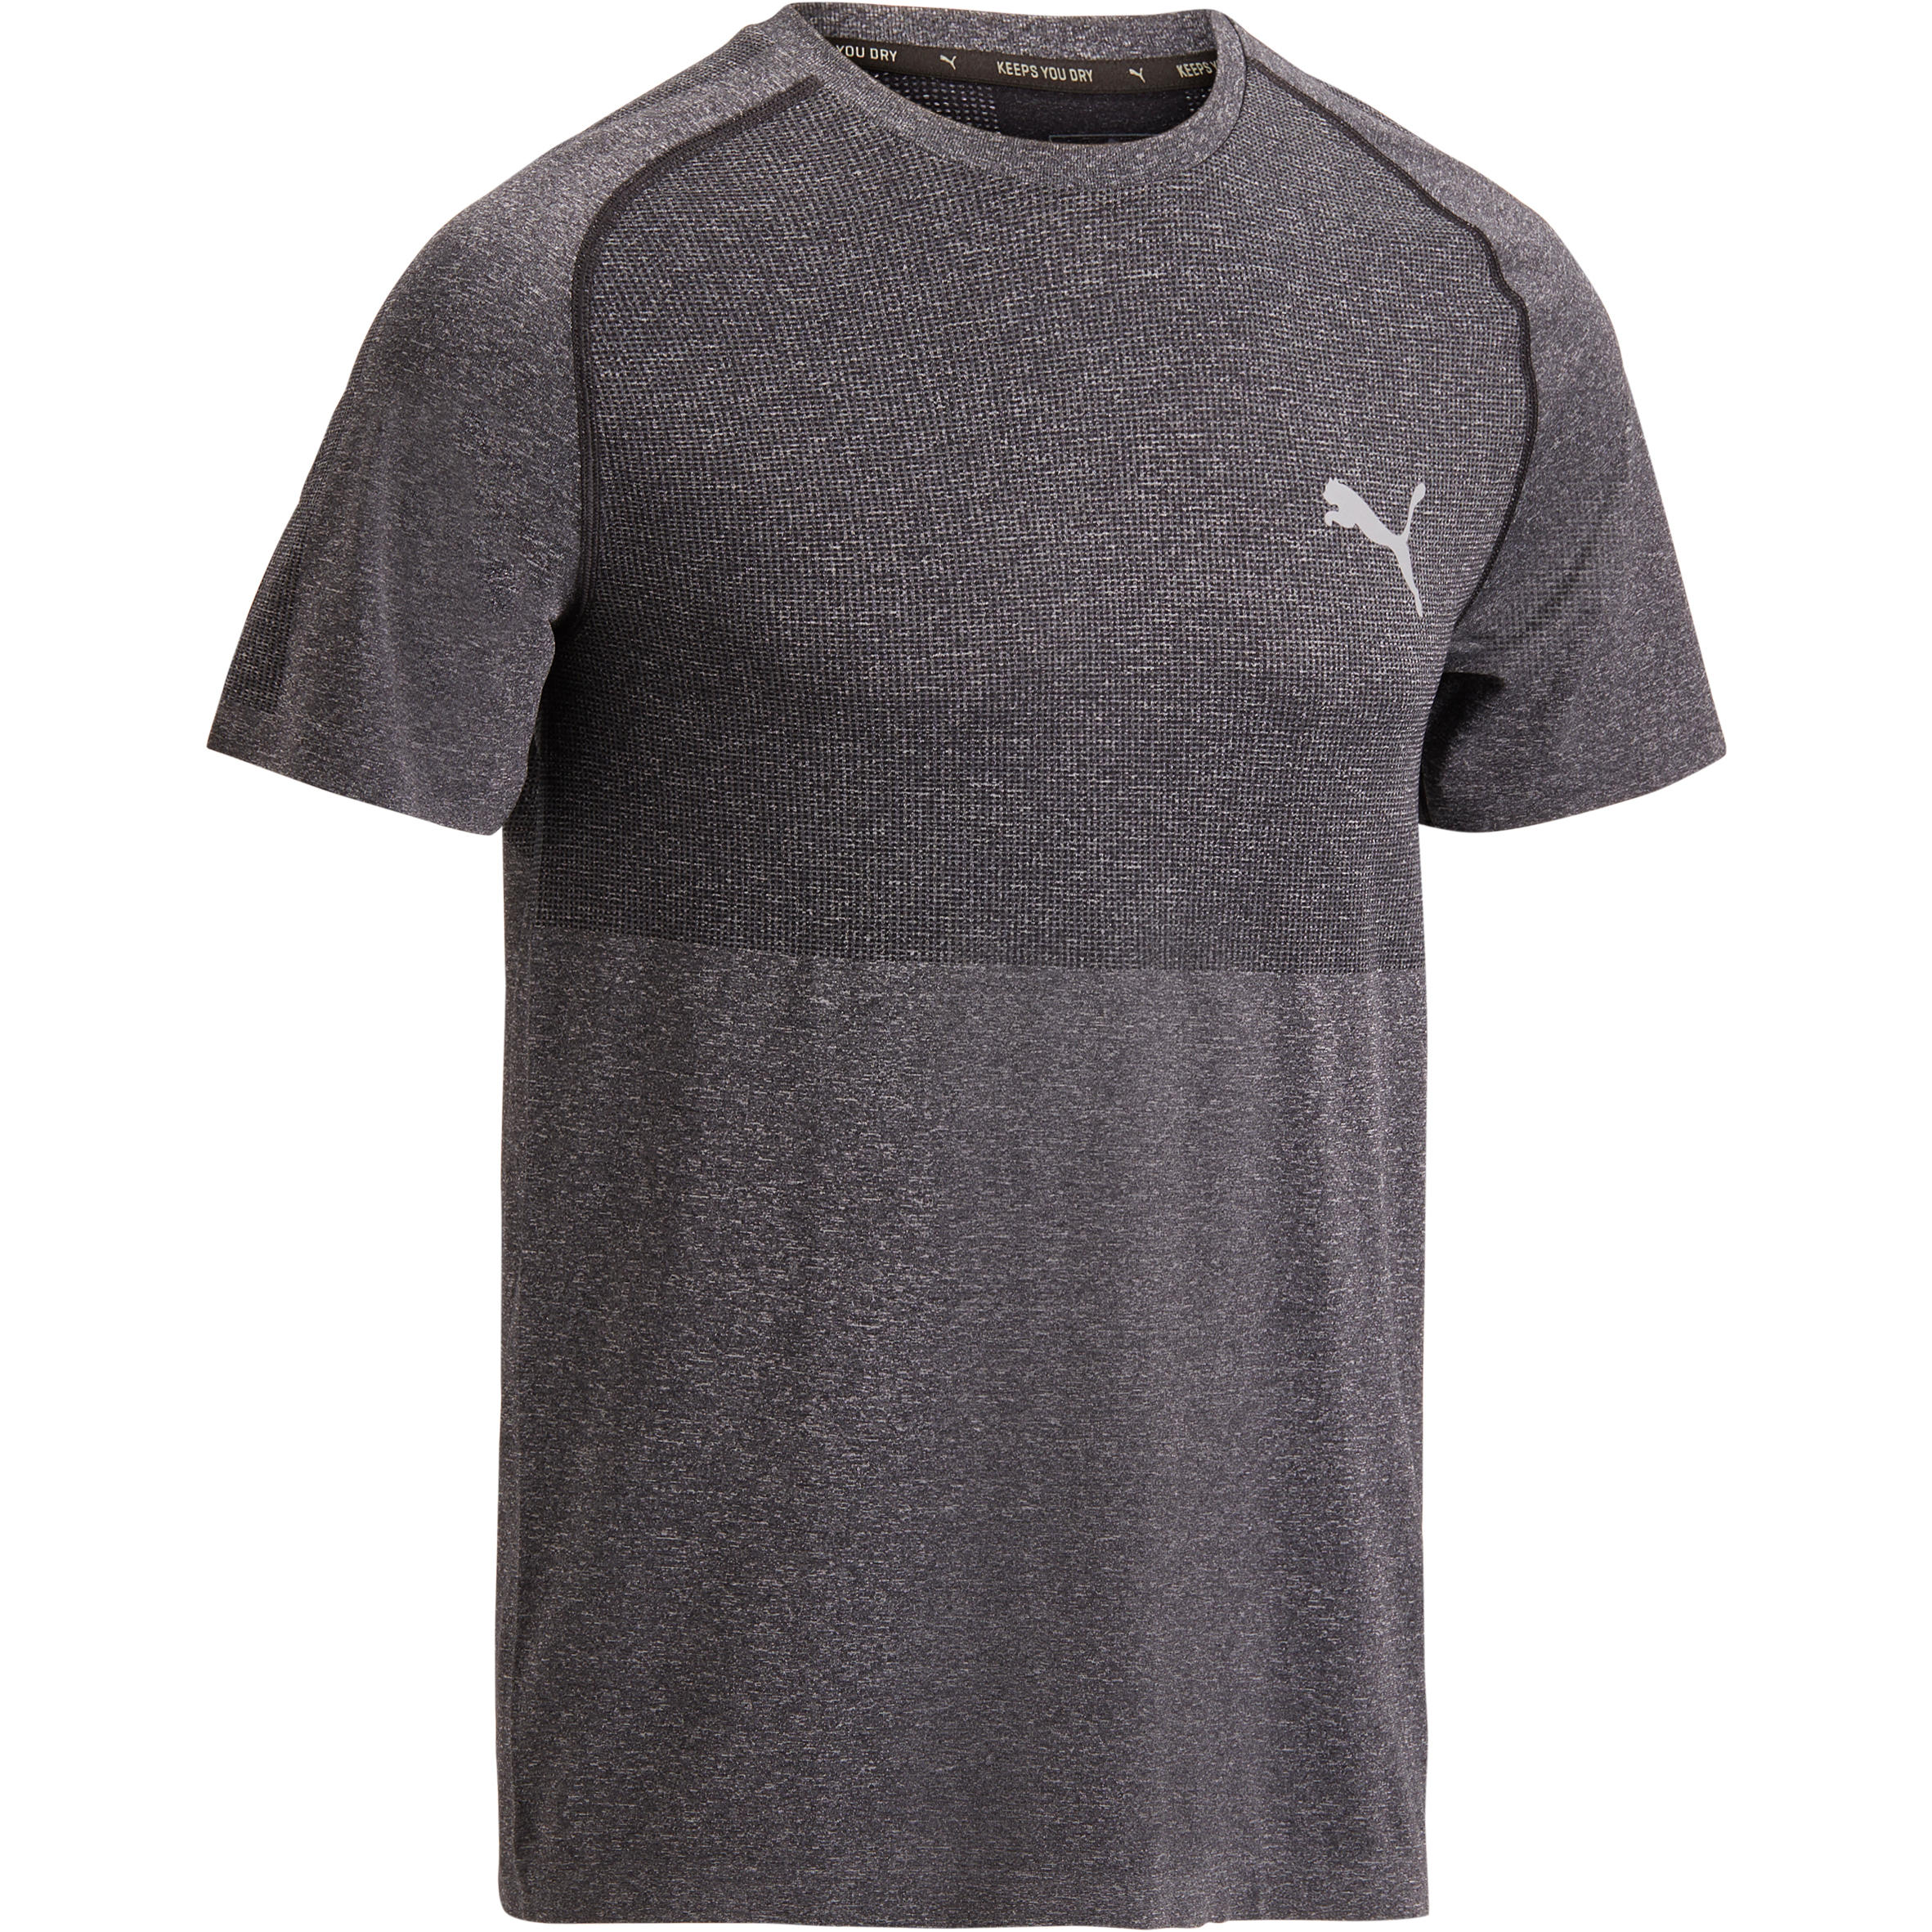 Puma Cardiofitness T-shirt Puma Evoknit voor heren grijs